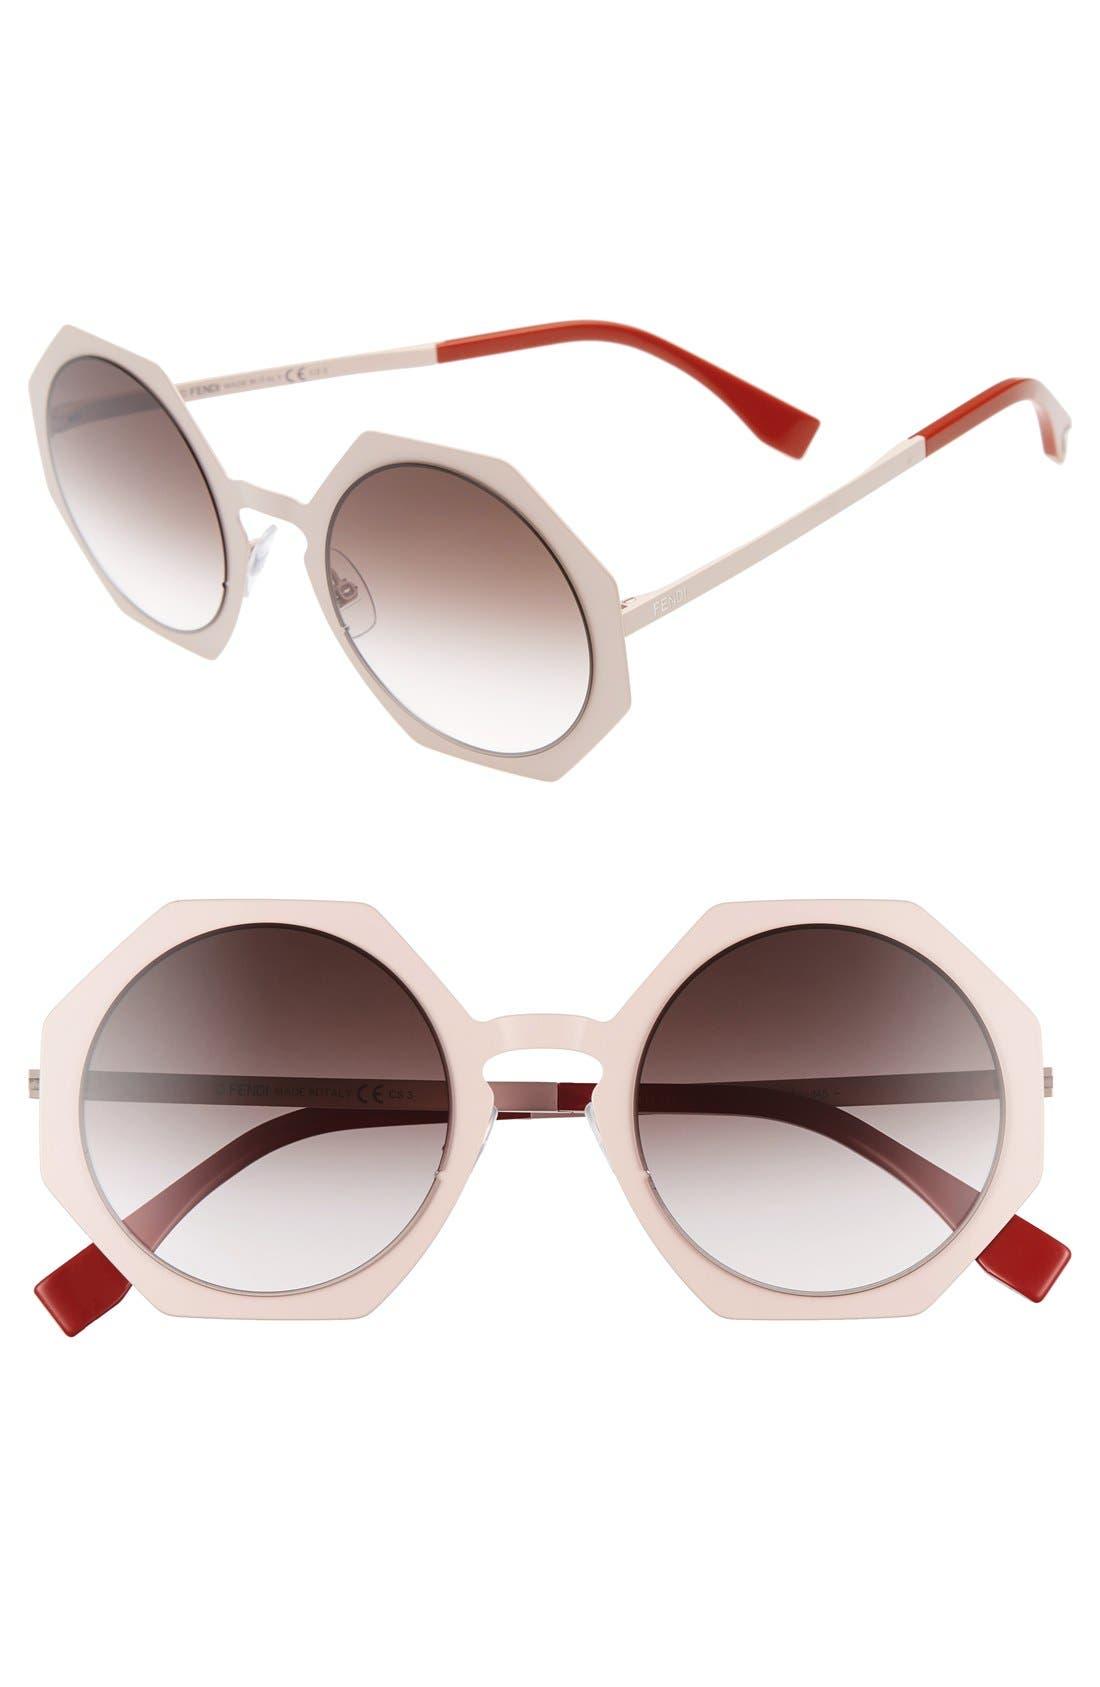 51mm Retro Octagon Sunglasses,                             Main thumbnail 2, color,